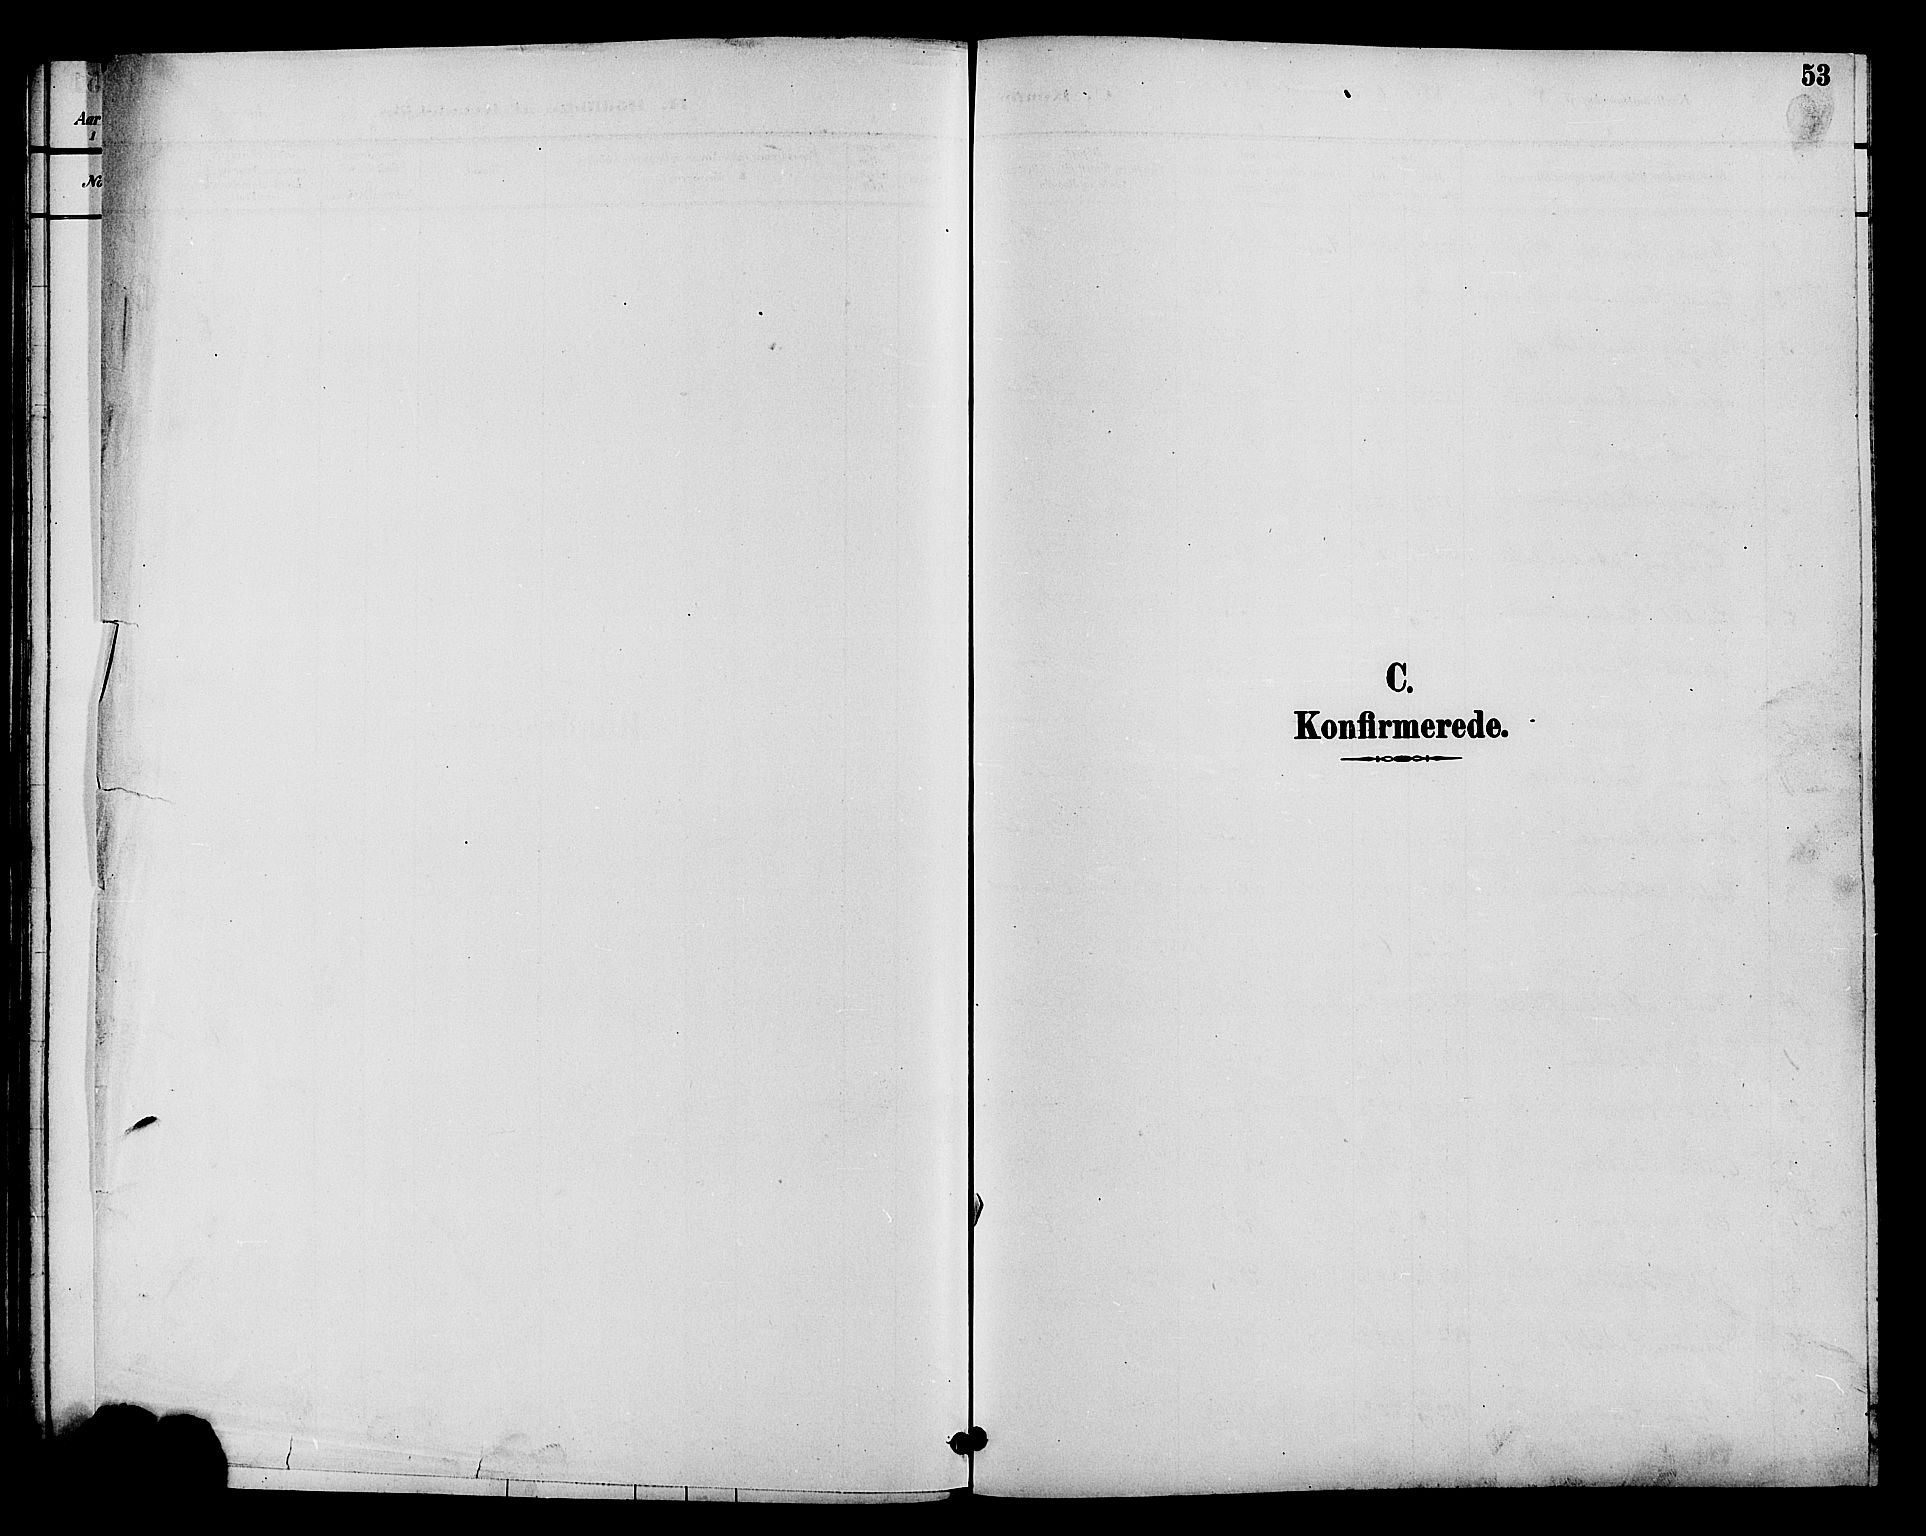 SAH, Øystre Slidre prestekontor, Klokkerbok nr. 4, 1887-1907, s. 53